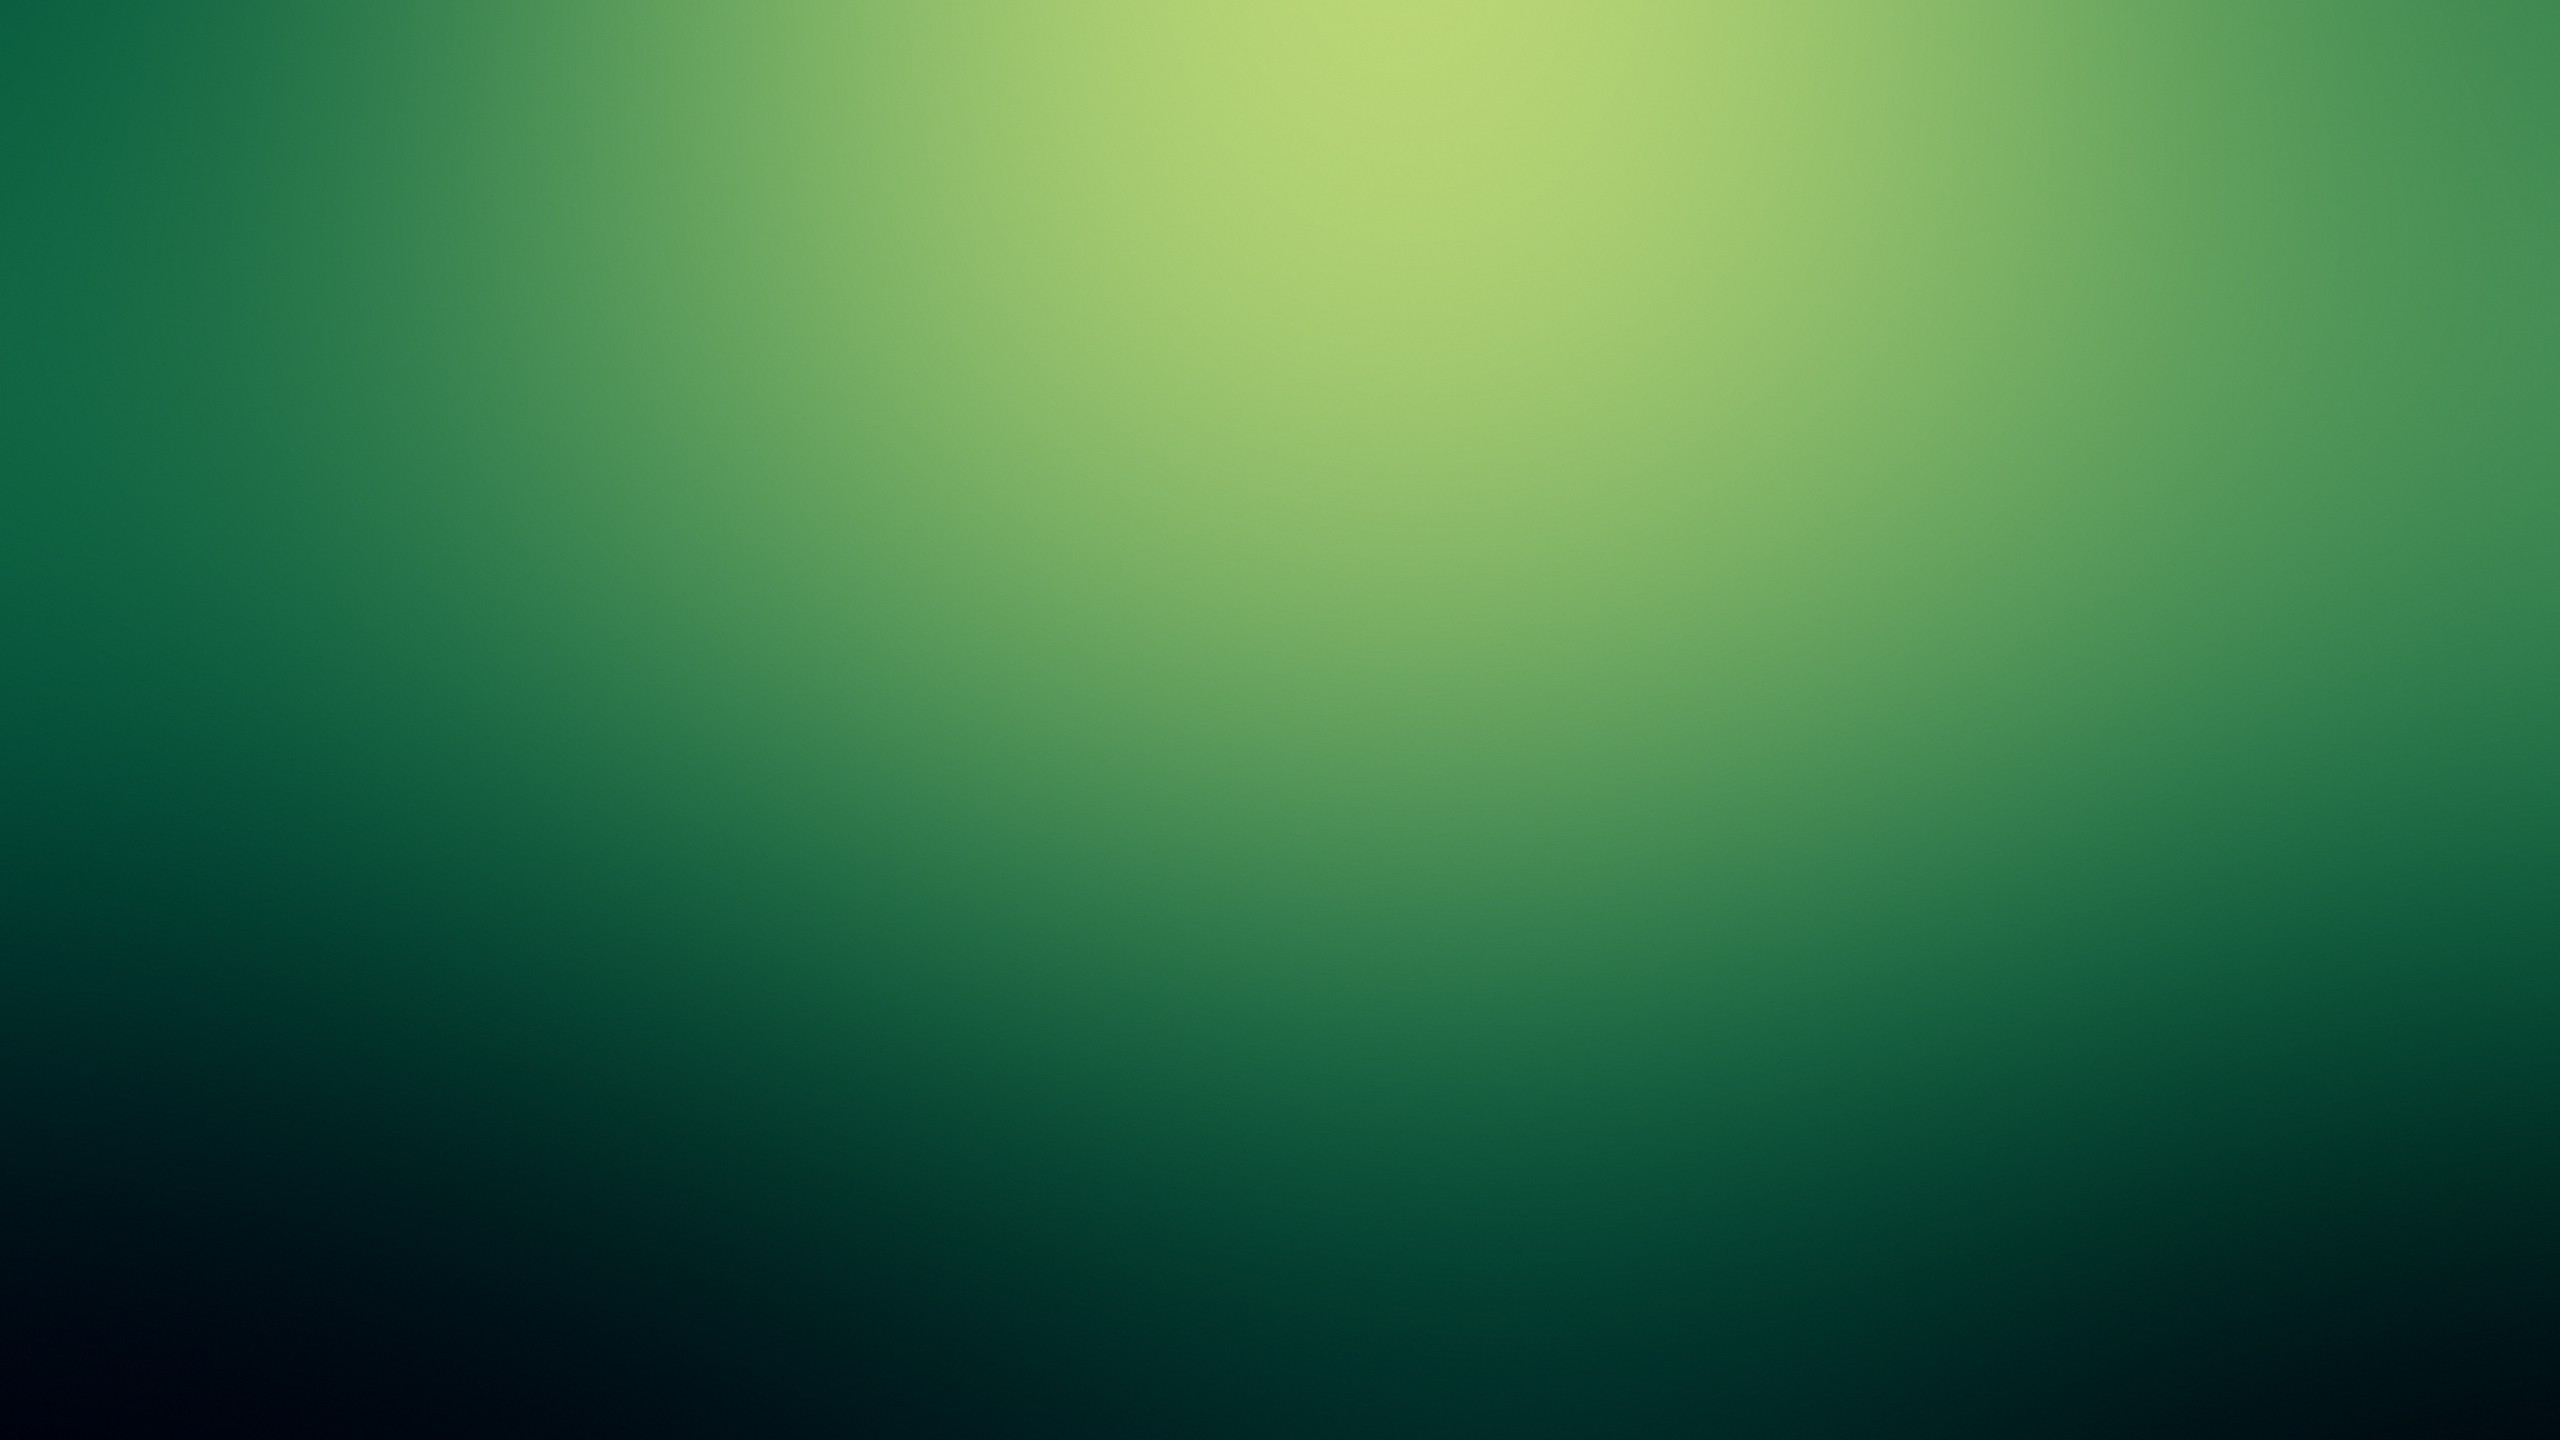 Res: 2560x1440, 15 Excellent HD Gradient Wallpapers - HDWallSource com